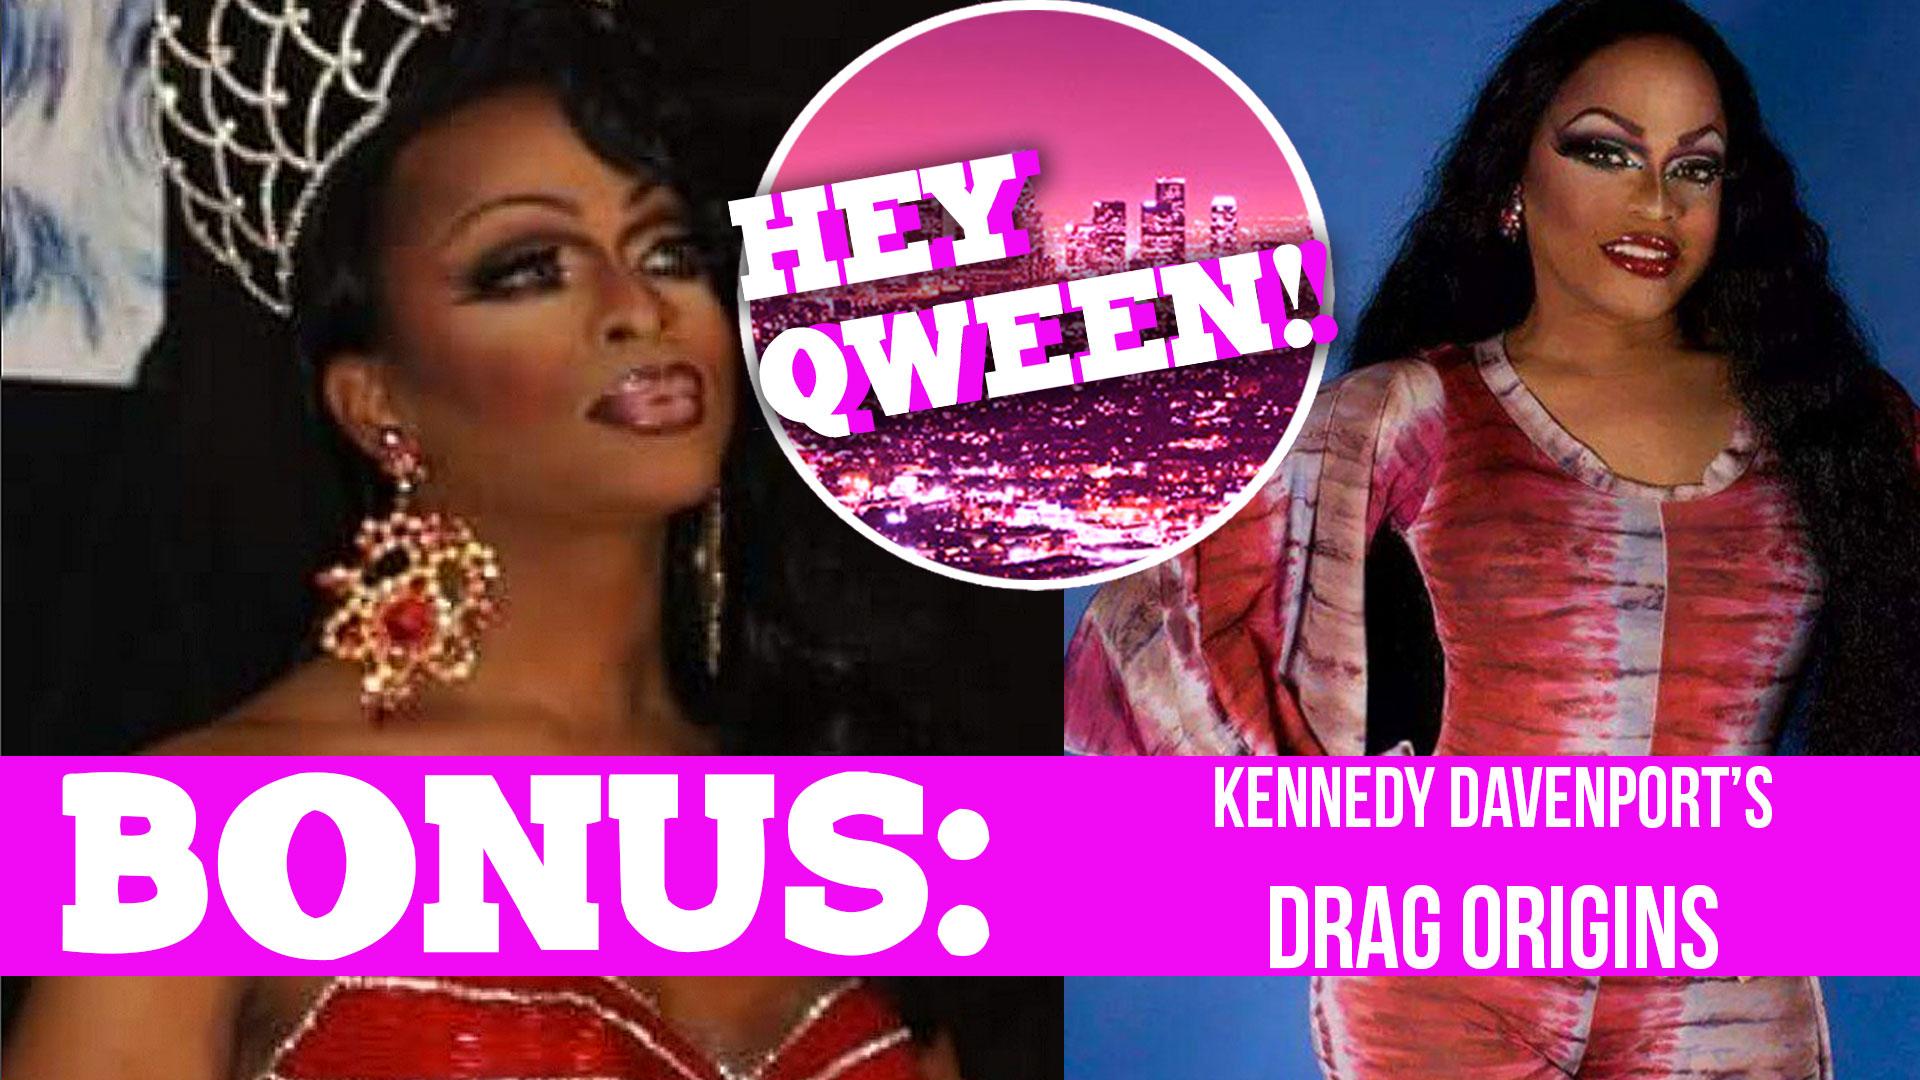 Hey Qween! BONUS: Kennedy Davenport's Drag Origins